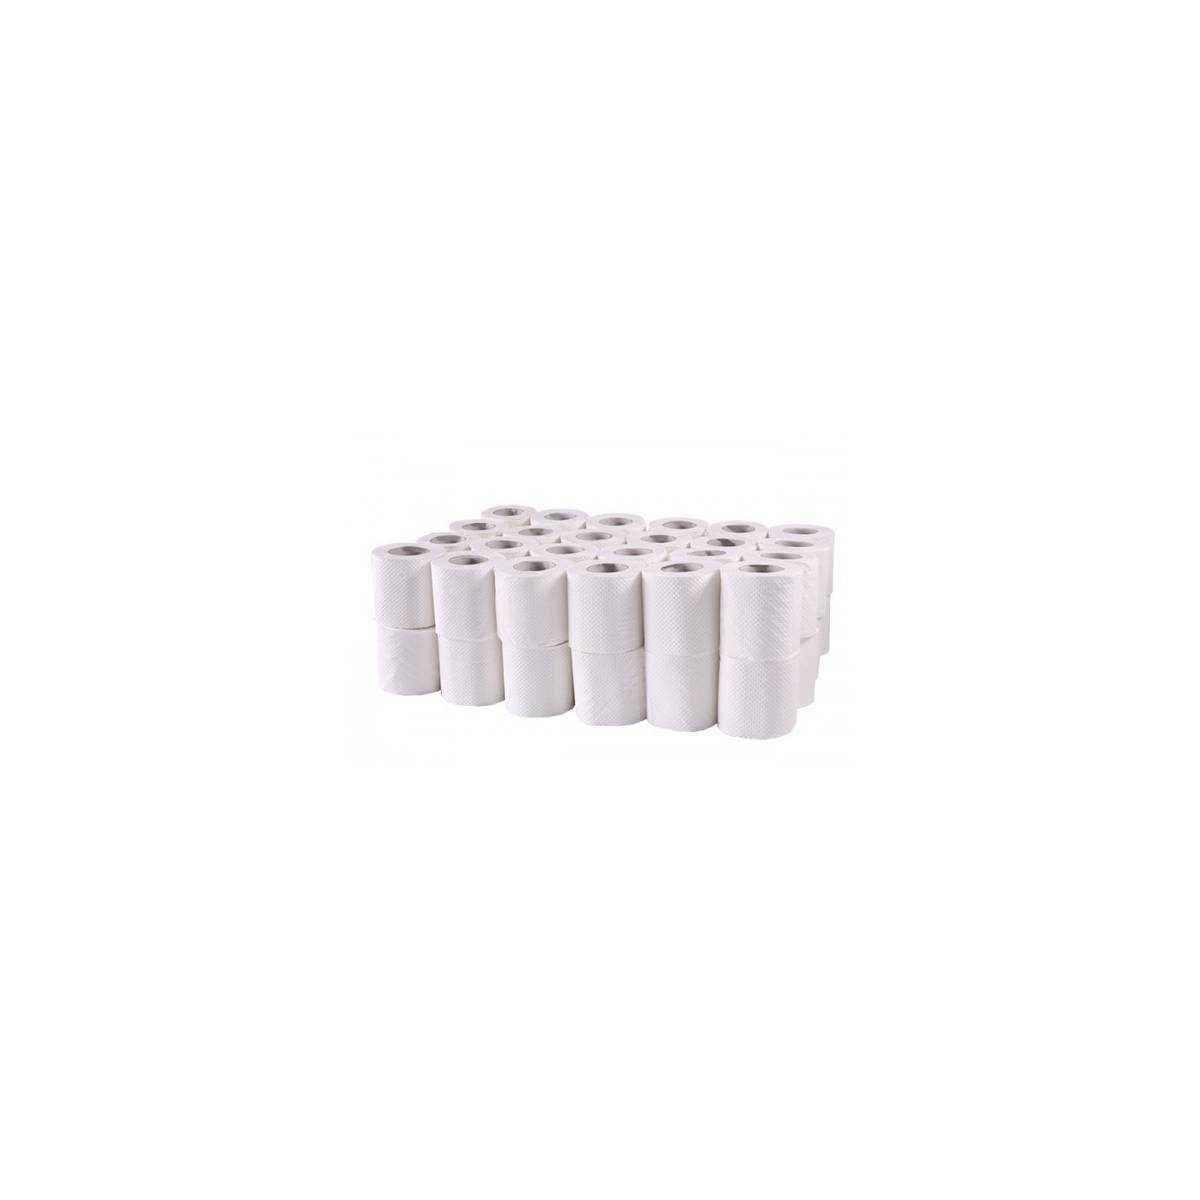 Туалетная бумага в рулоне STANDART (B917) B917 Tischa Papier